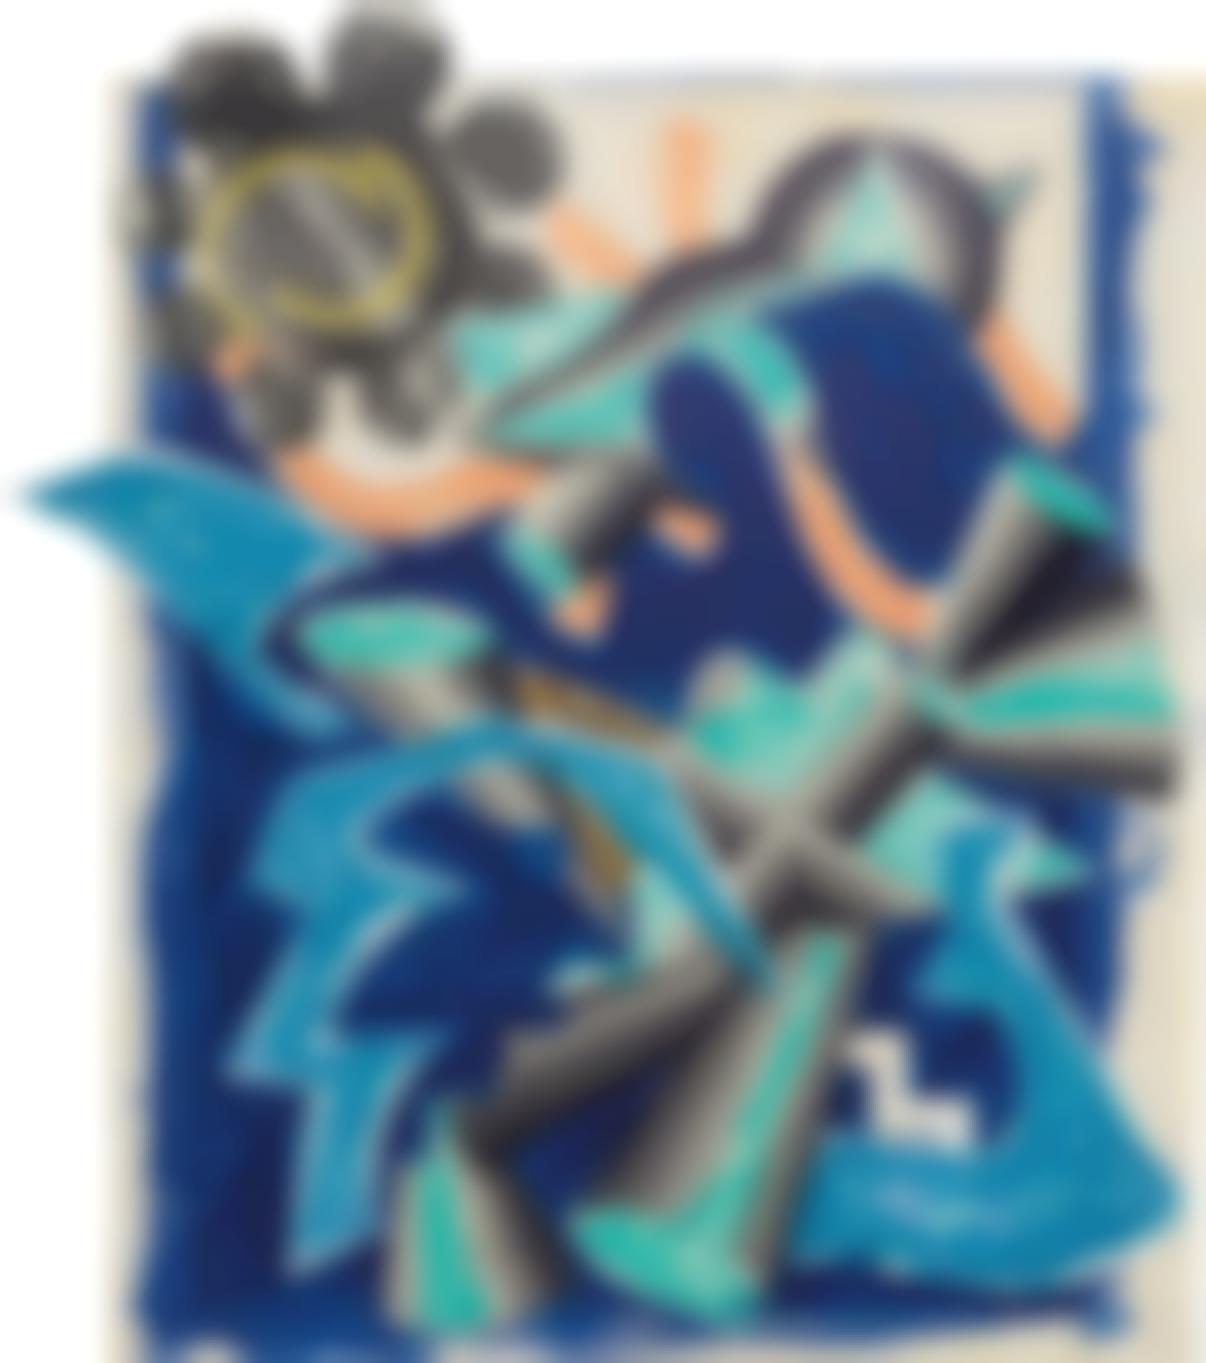 Frank Stella-B. Had Gadya: Back Cover, from Illustrations After El Lissitzky's Had Gadya-1984